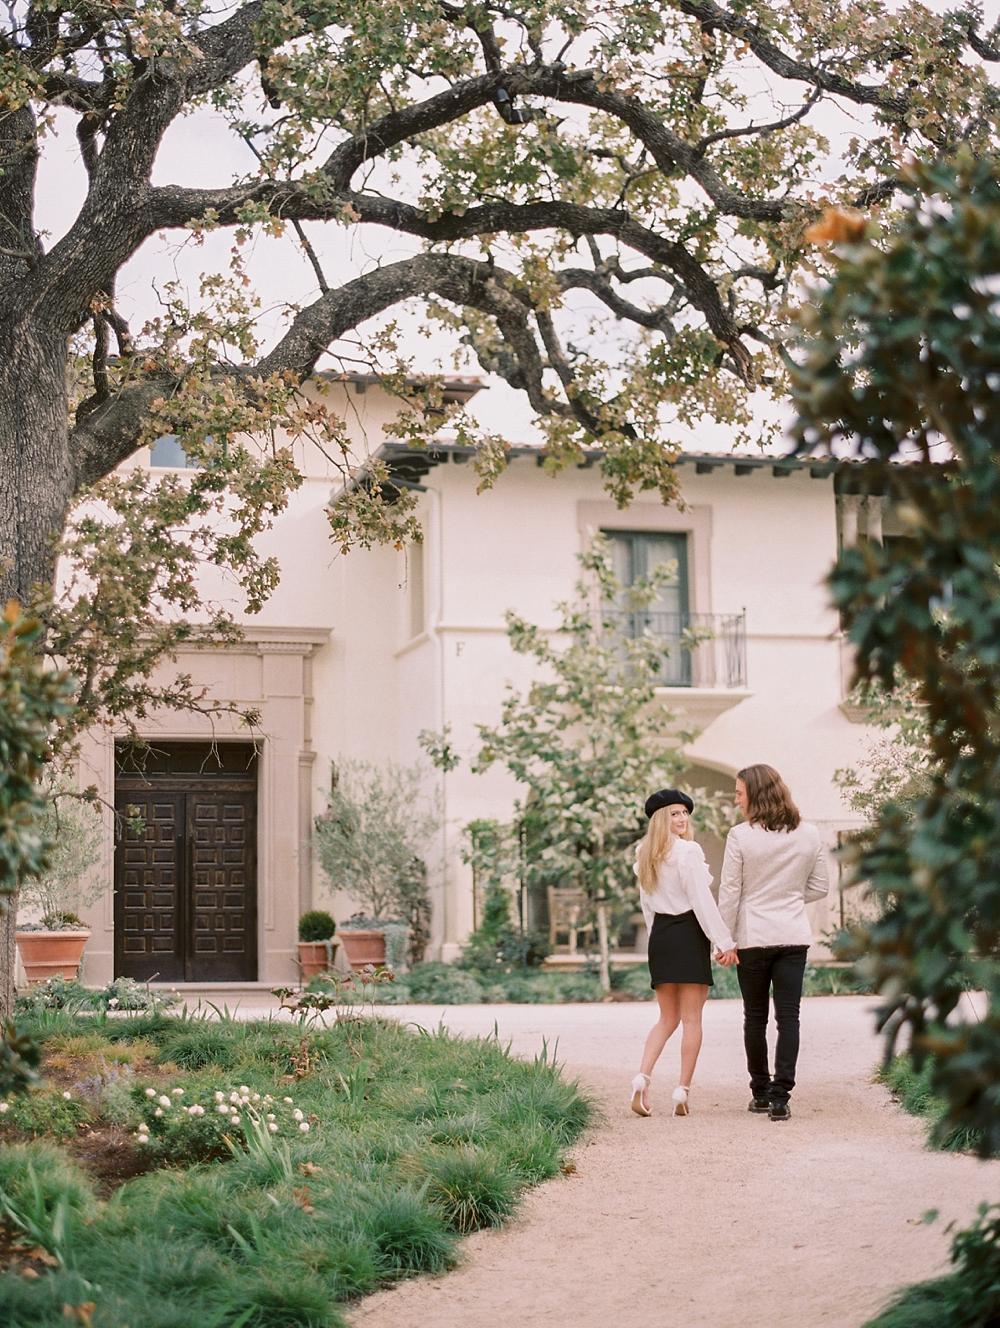 kristin-la-voie-photography-Austin-Wedding-Boudoir-Photographer-Commodore-Perry-Estate-78